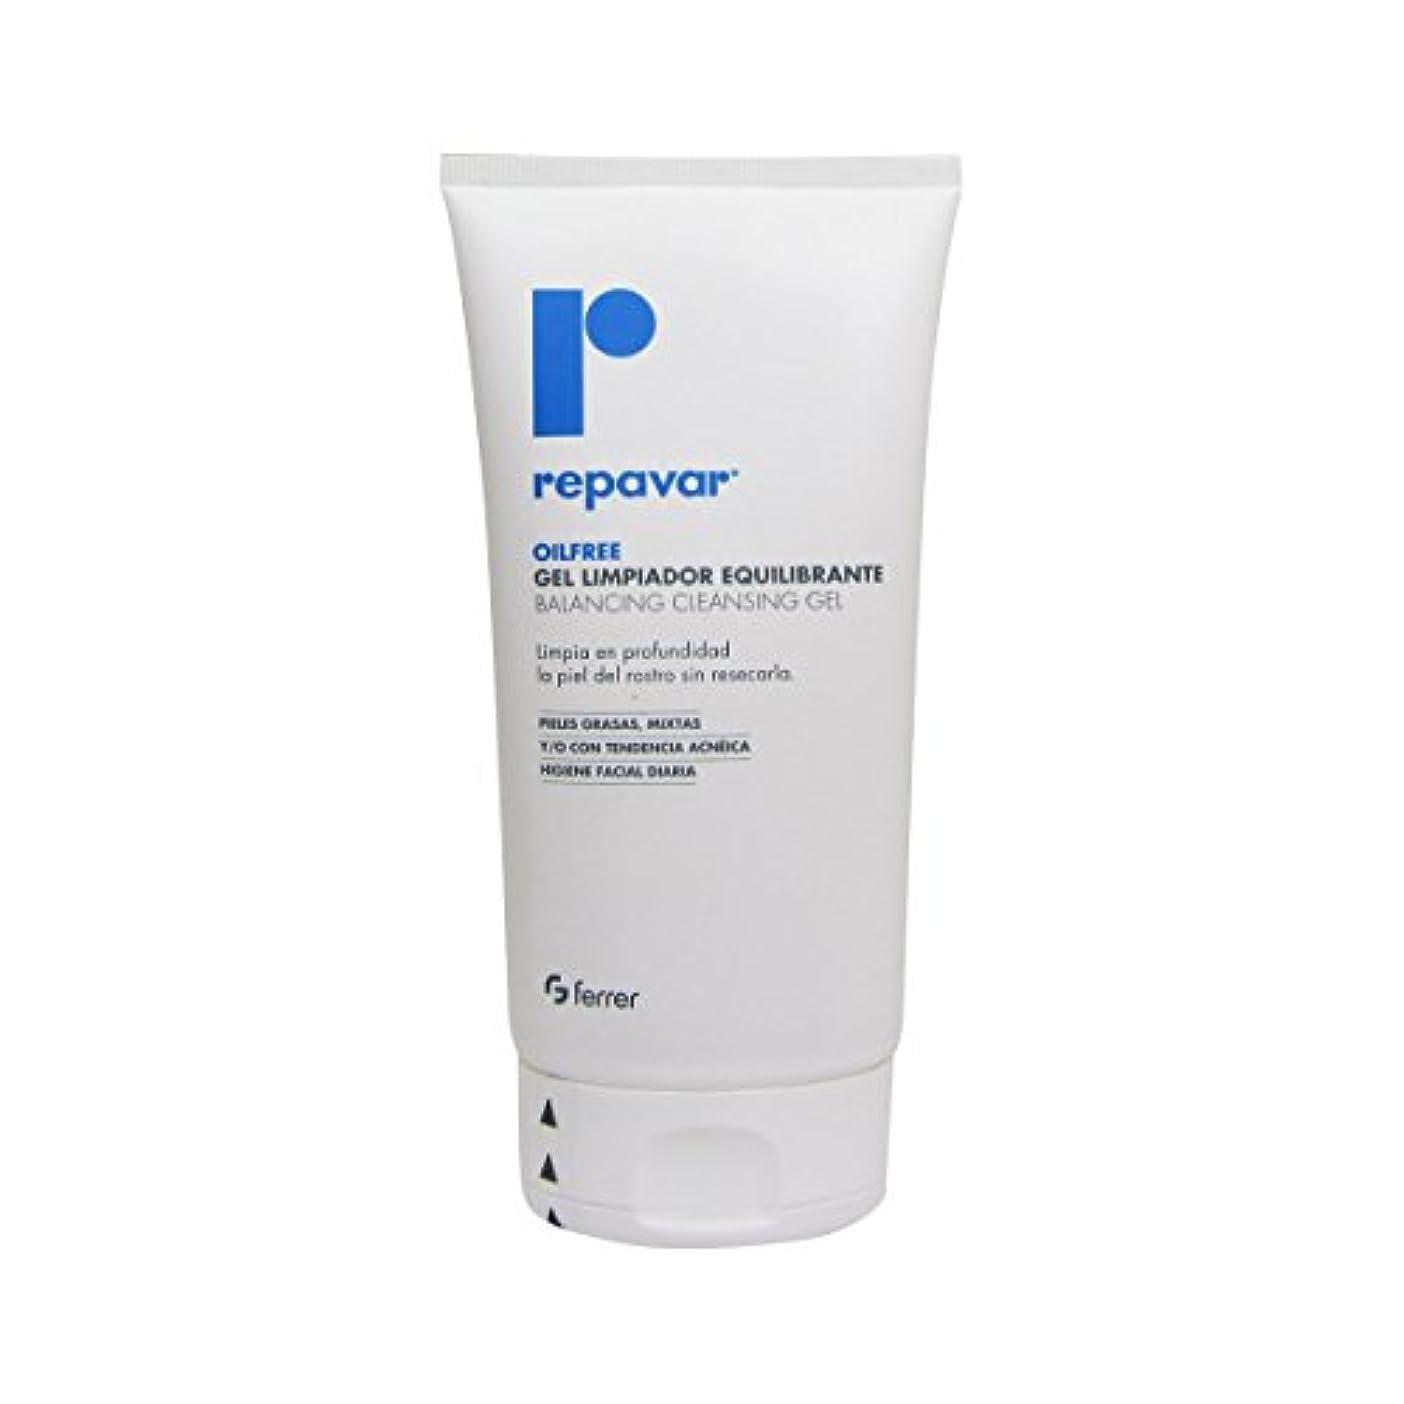 Repavar Oil Free Cleansing Gel 150ml [並行輸入品]